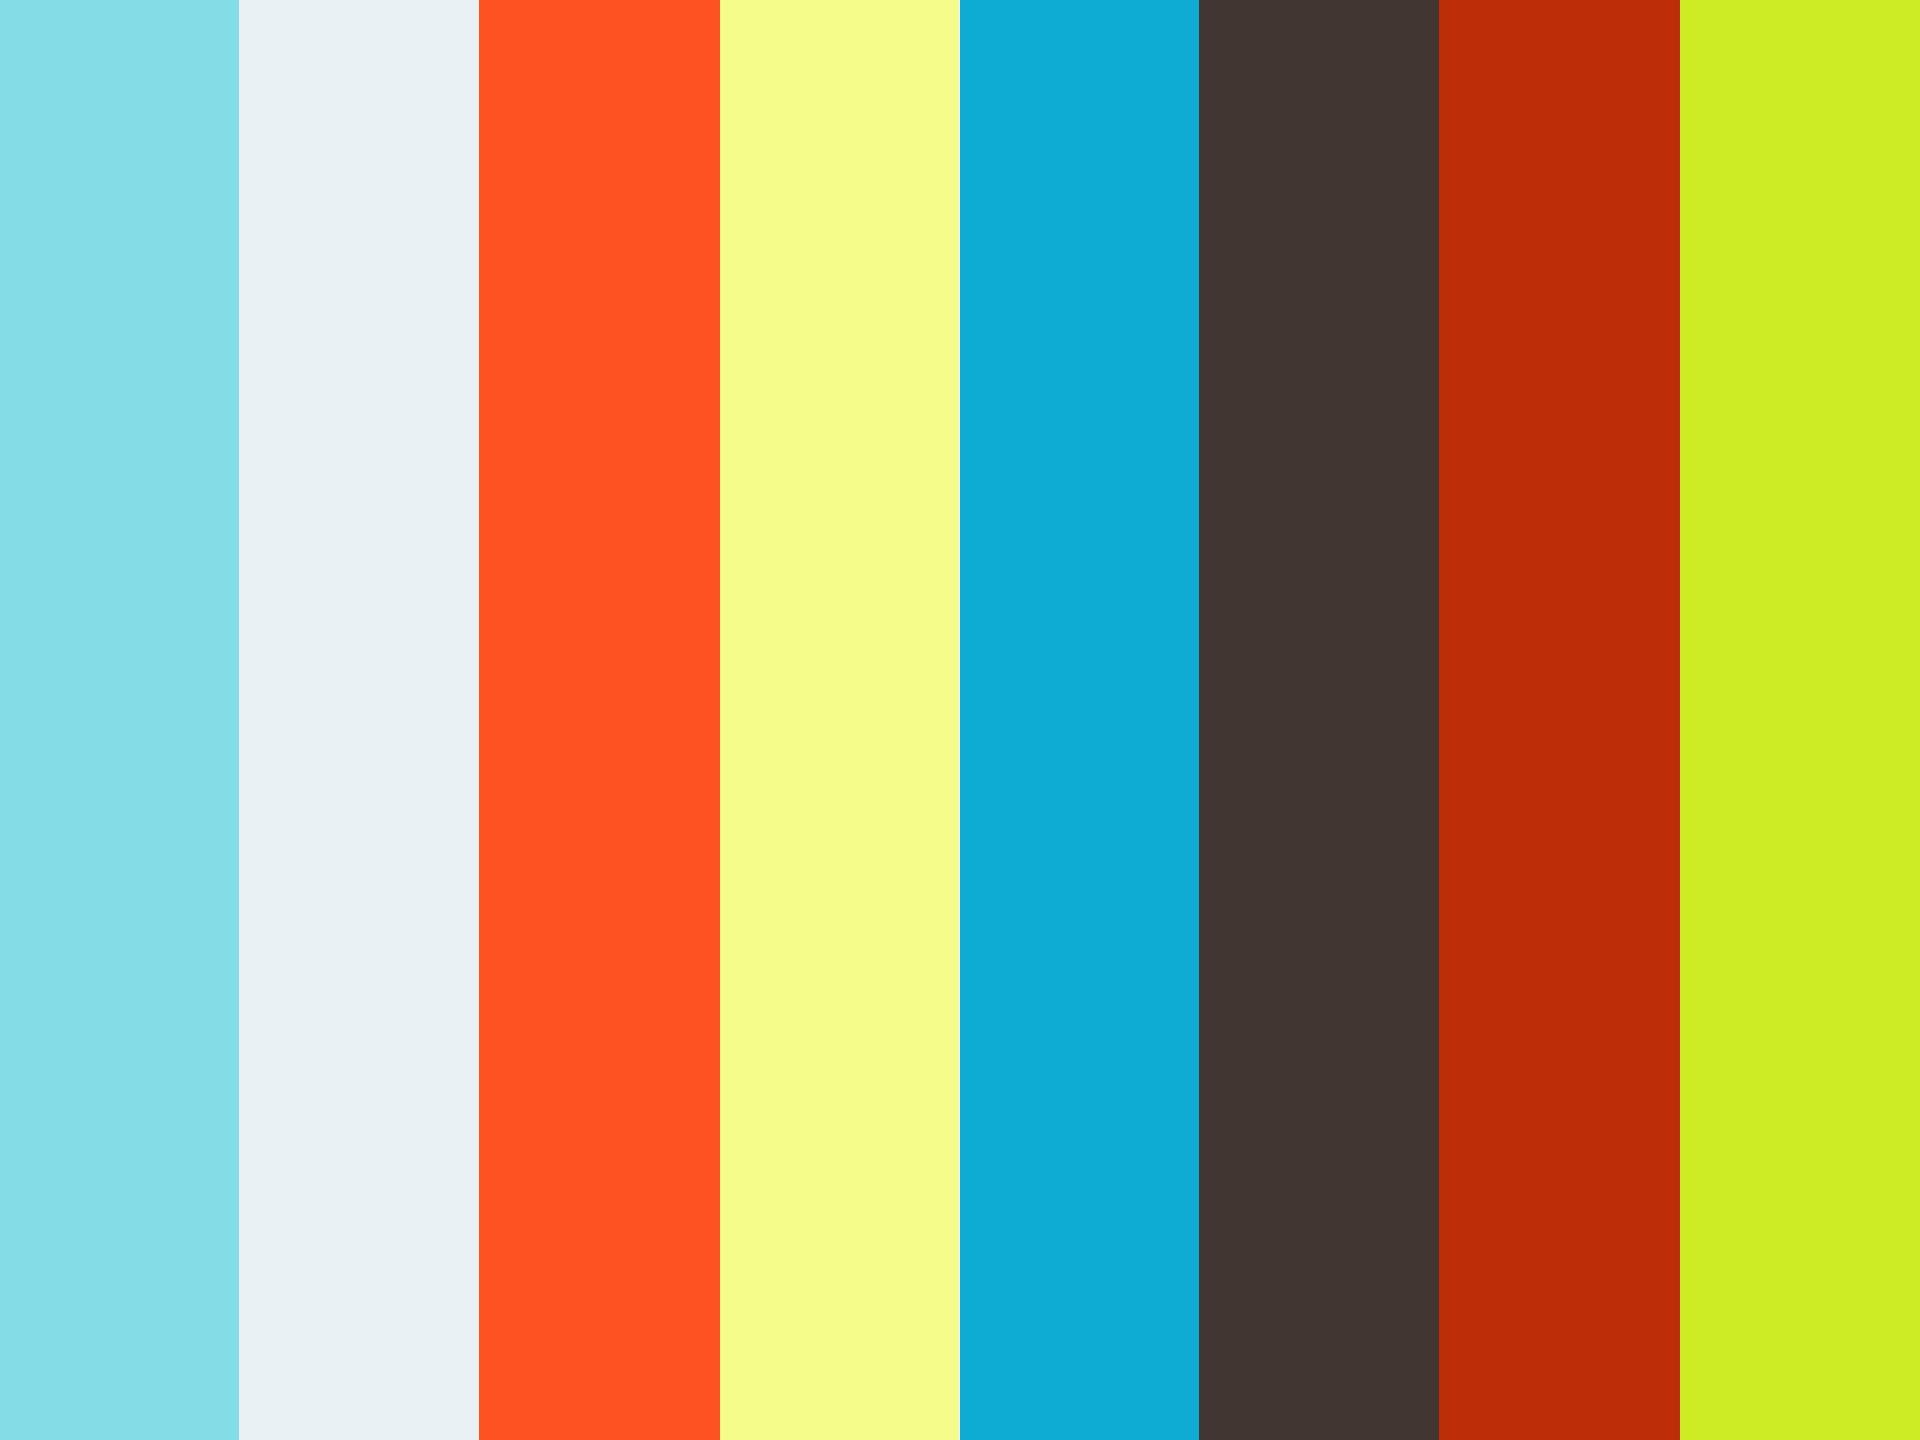 JEEP GRAND CHEROKEE - BLACK - 2020